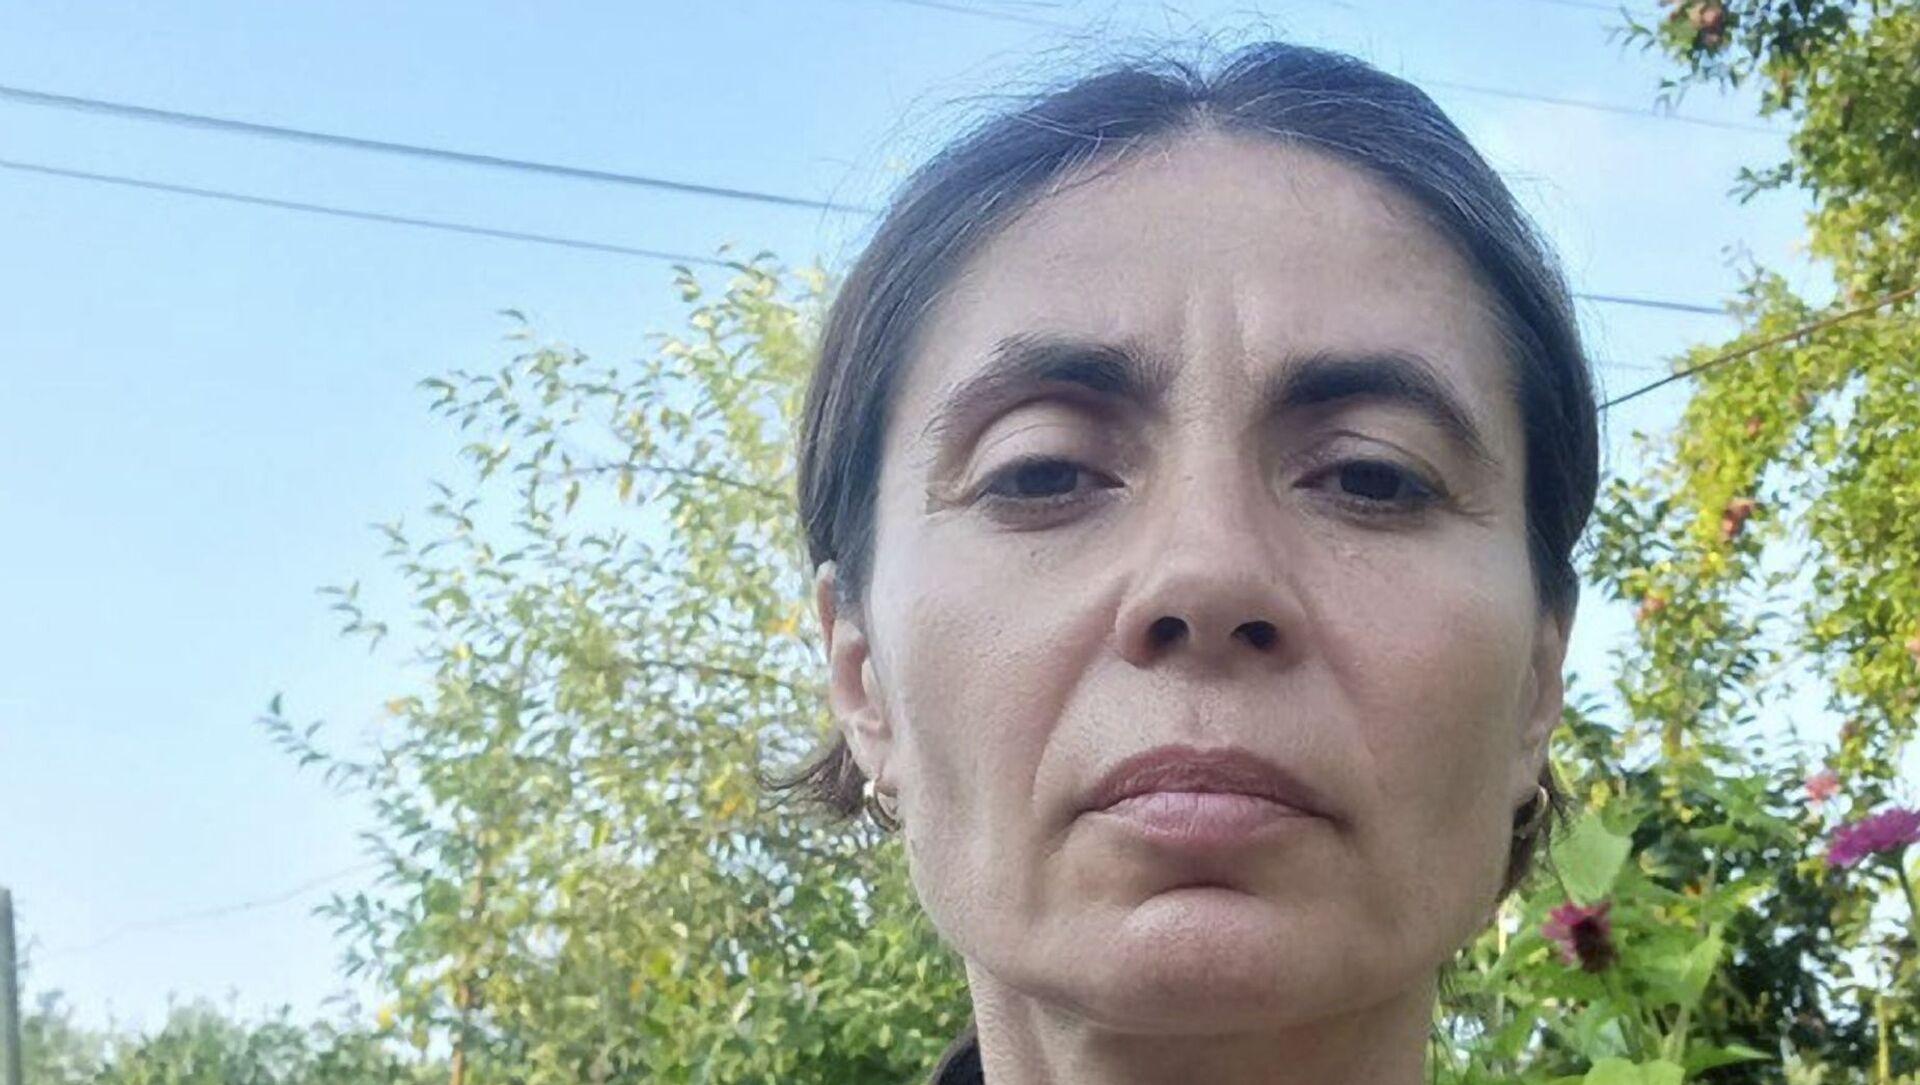 Жанна Топчян  - Sputnik Абхазия, 1920, 25.08.2021